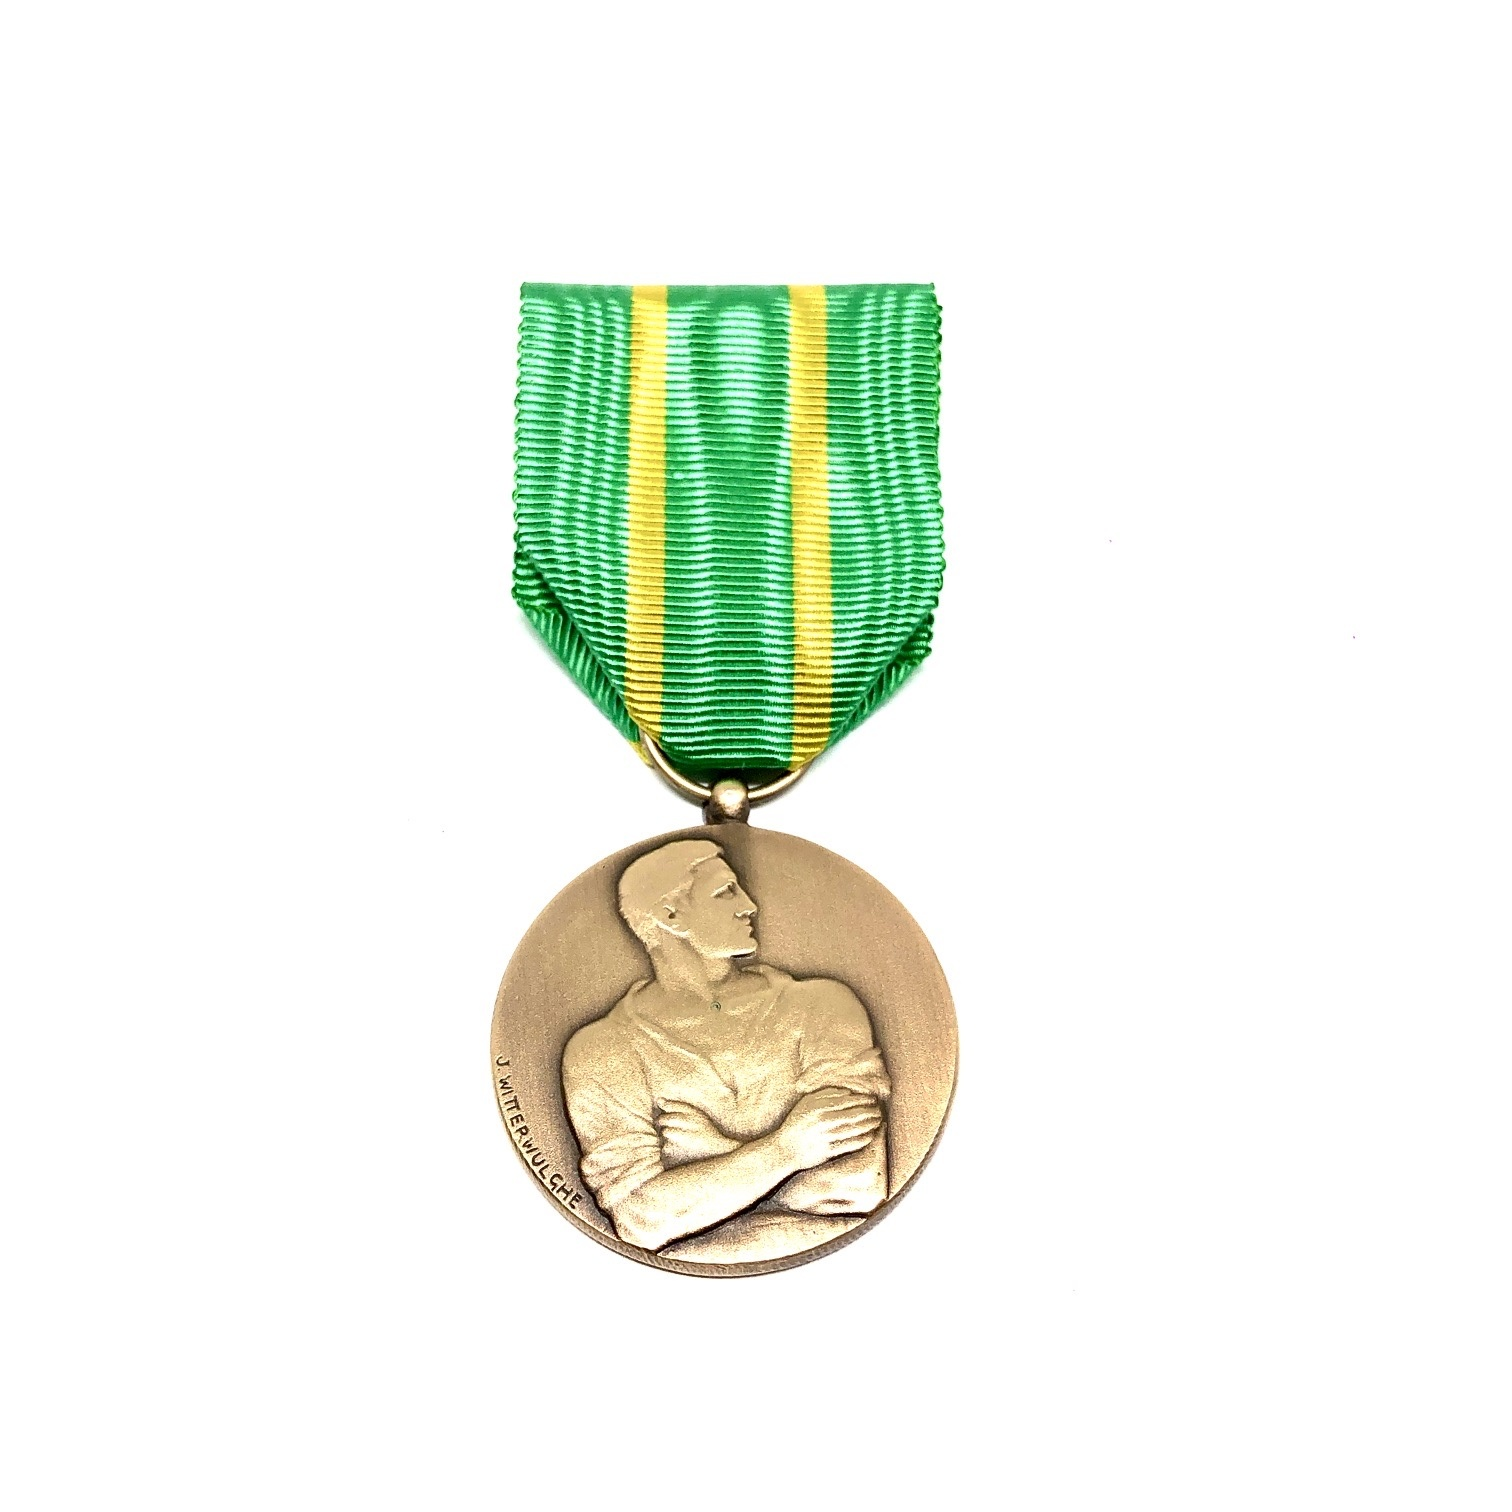 Civilian Disobedience Medal